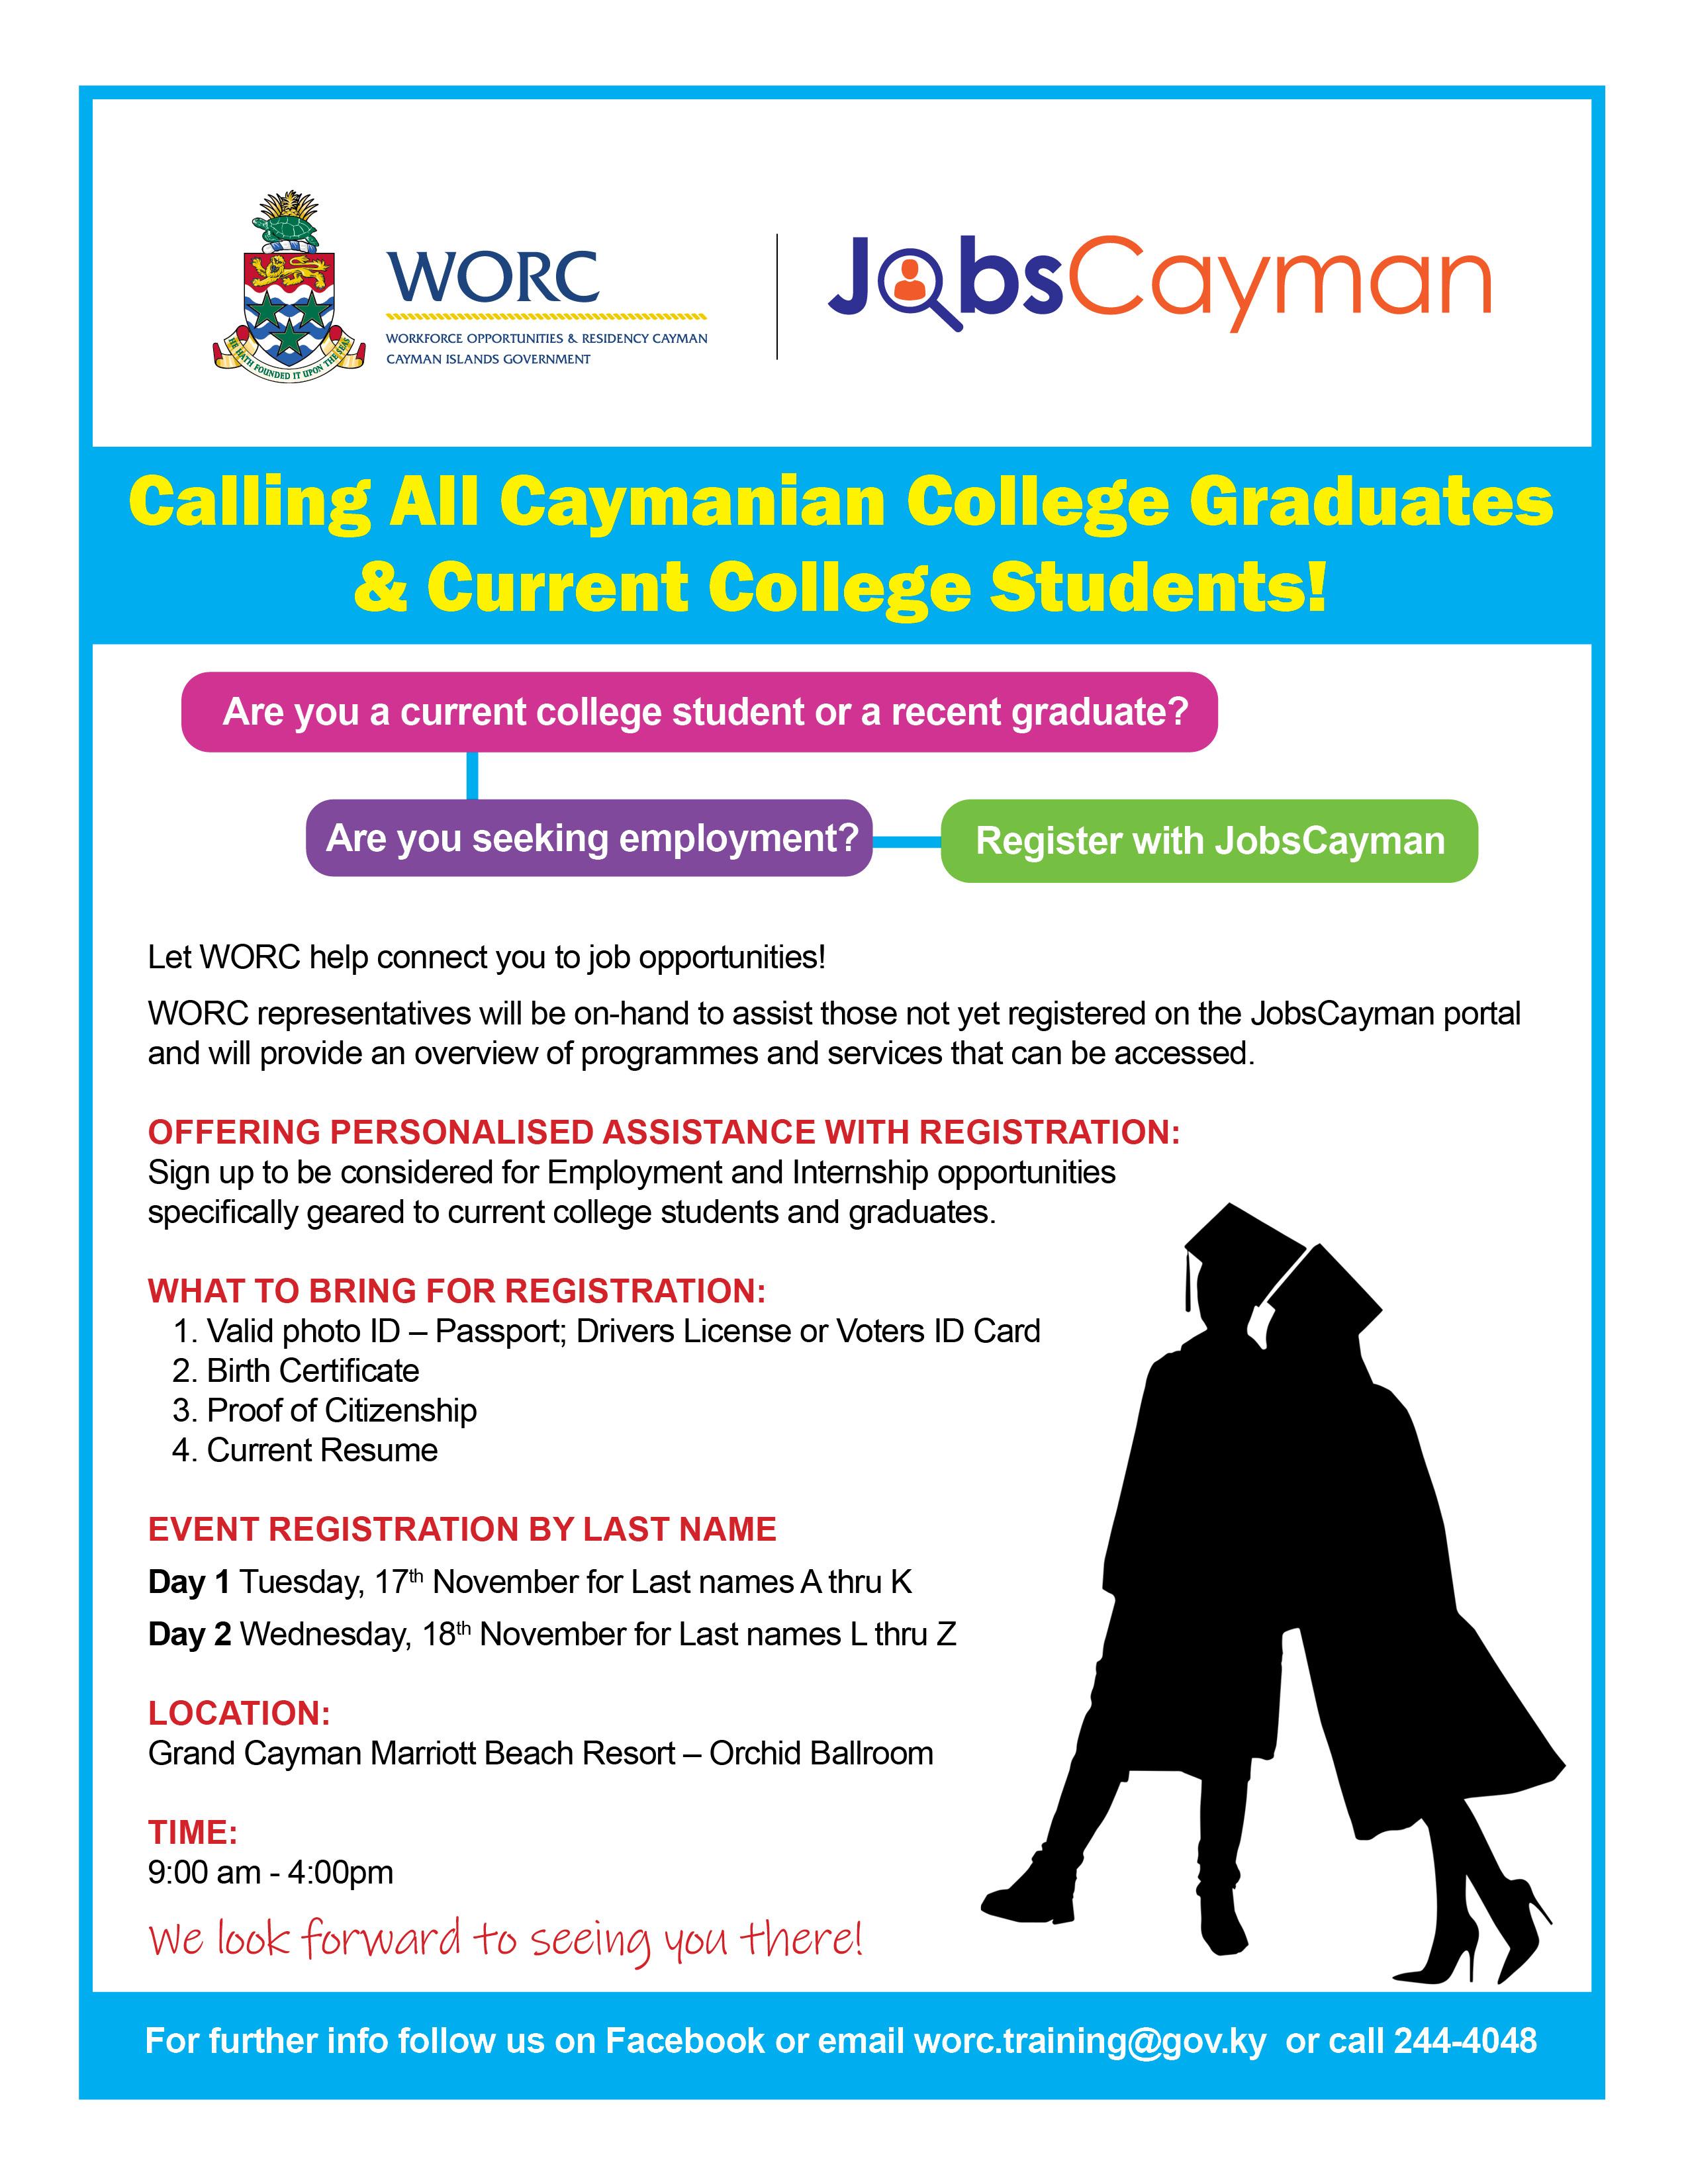 WORC_JobsCayman_Graduates and Current Student Registration Event_Flyer (002)